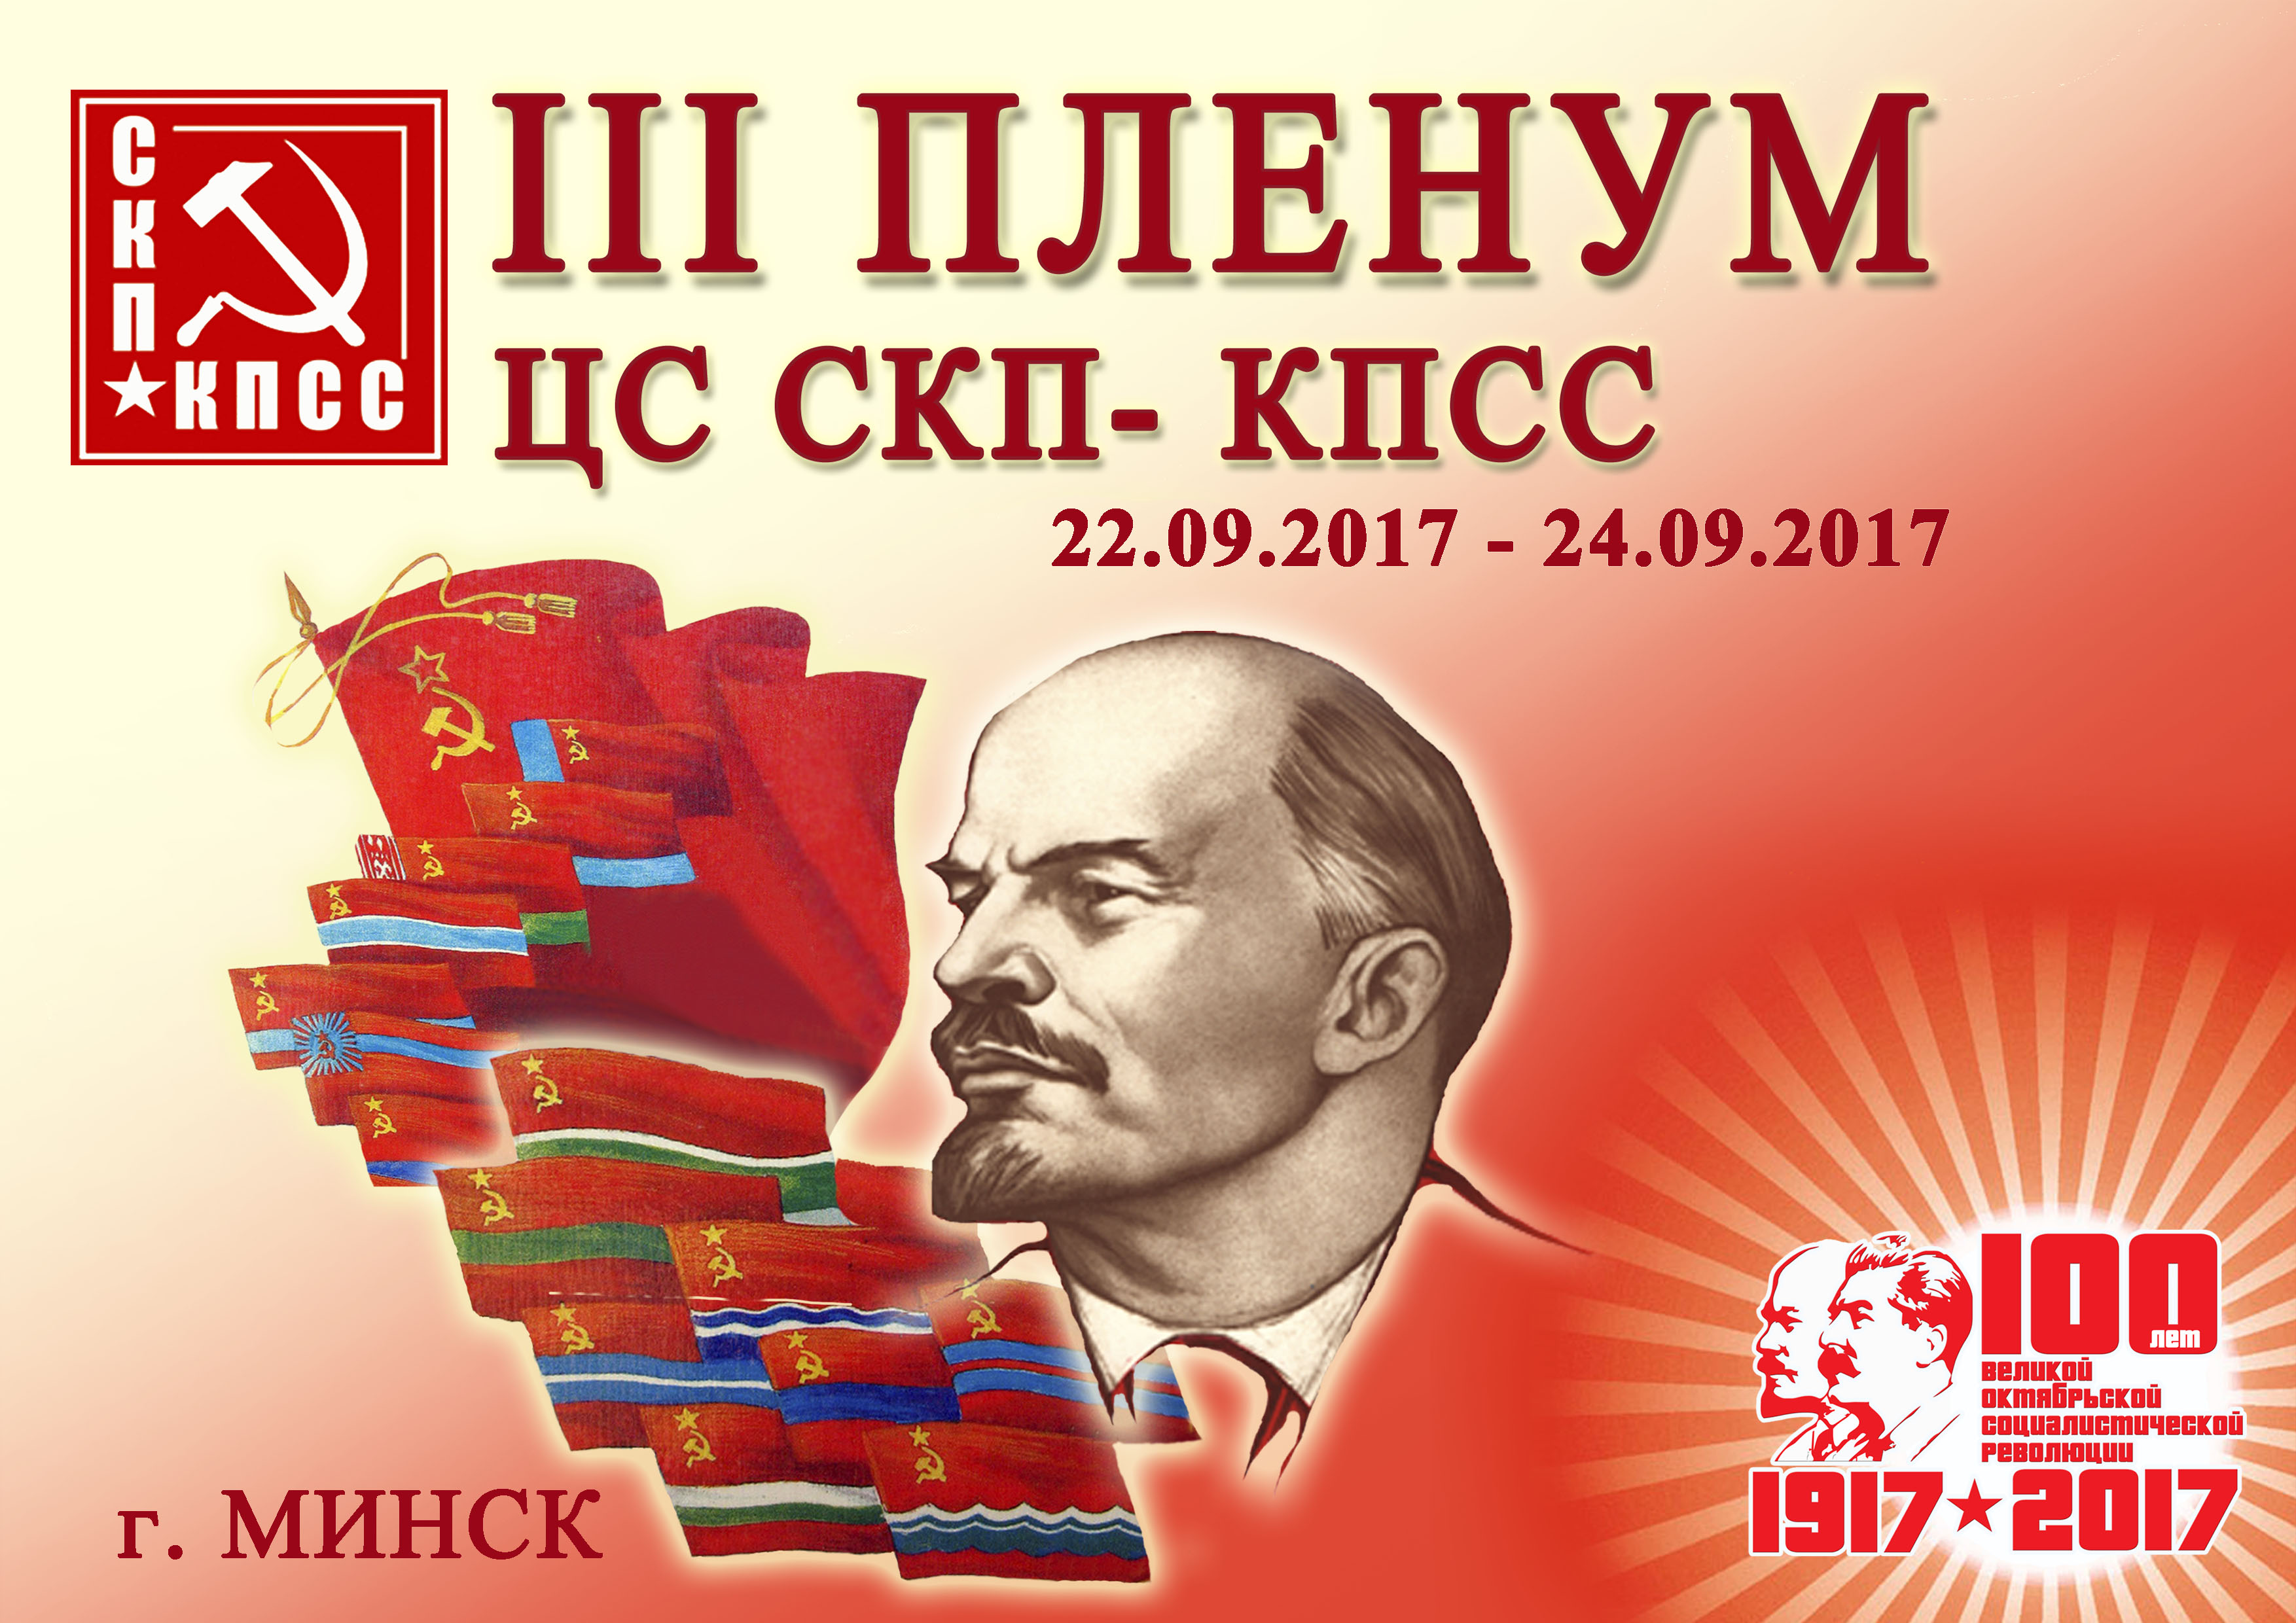 АНОНС 3 ПЛЕНУМ 2017